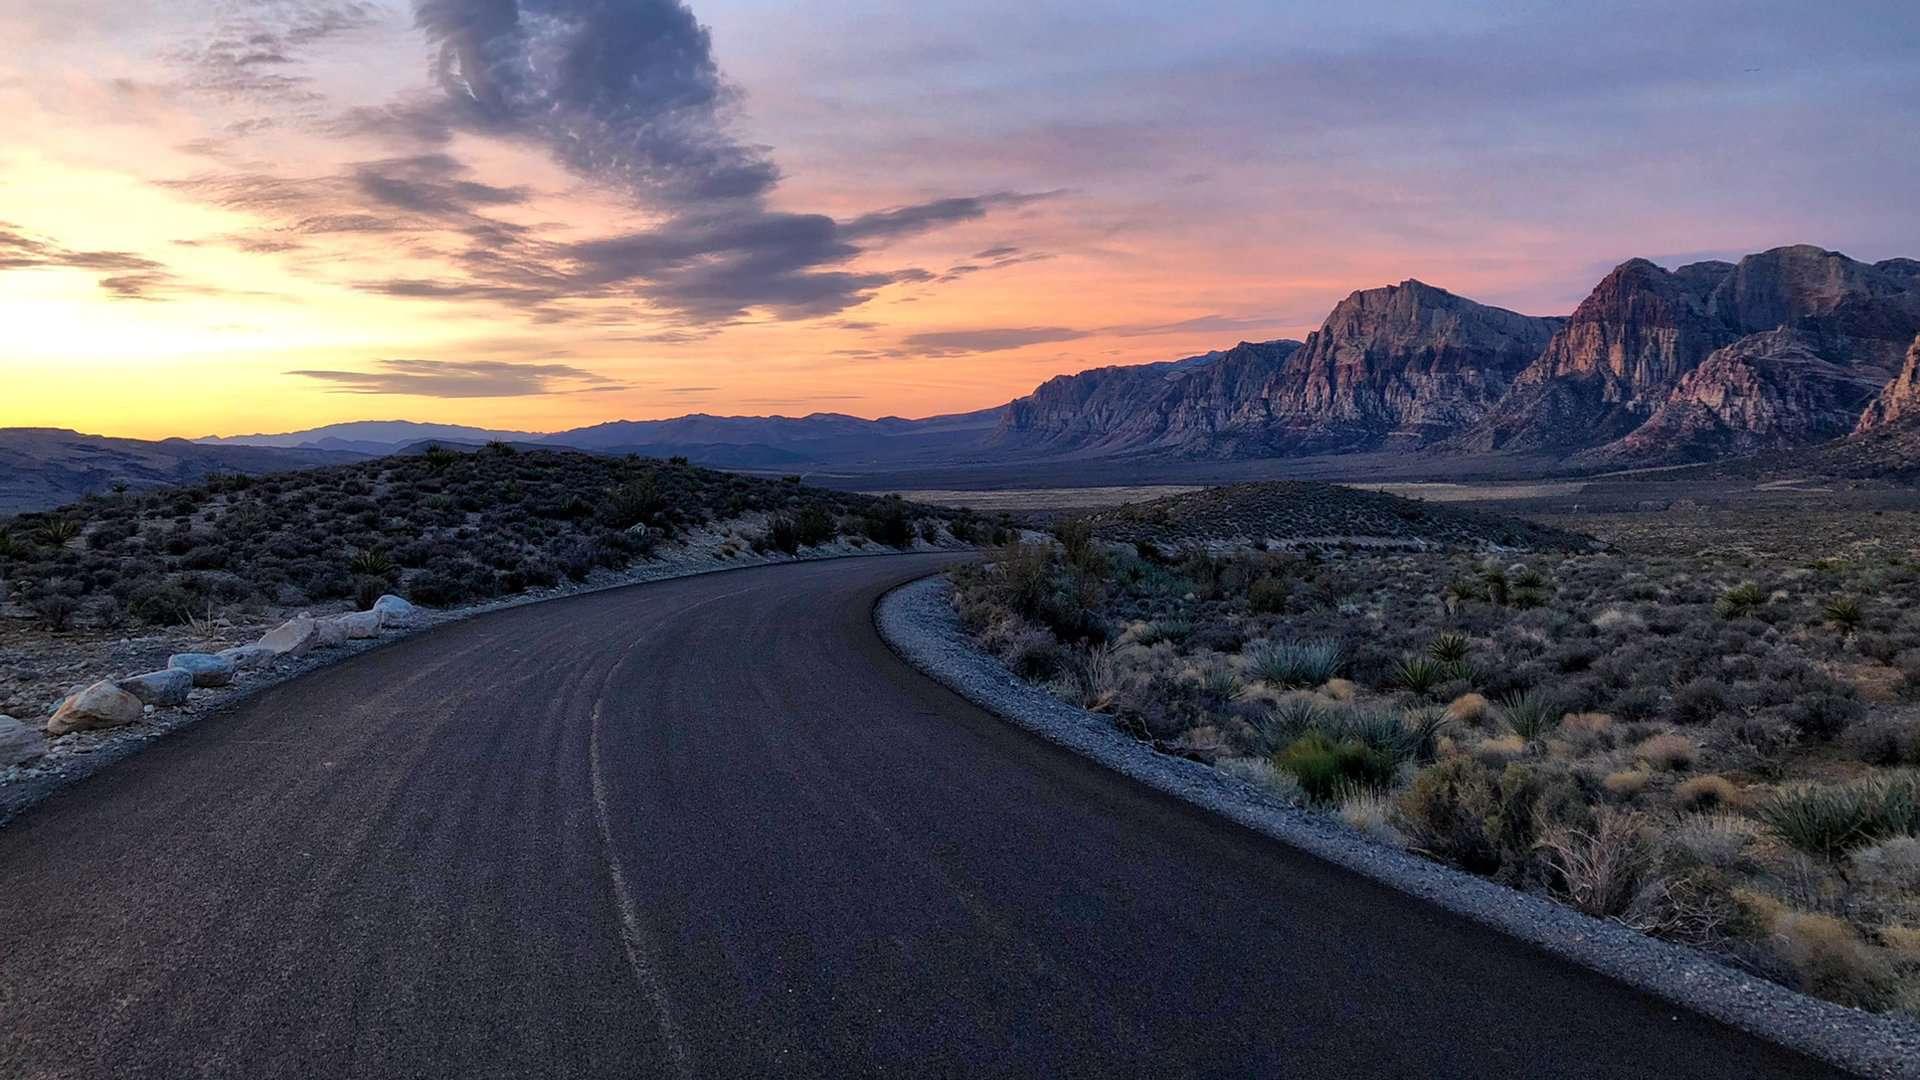 Droga, zachód słońca